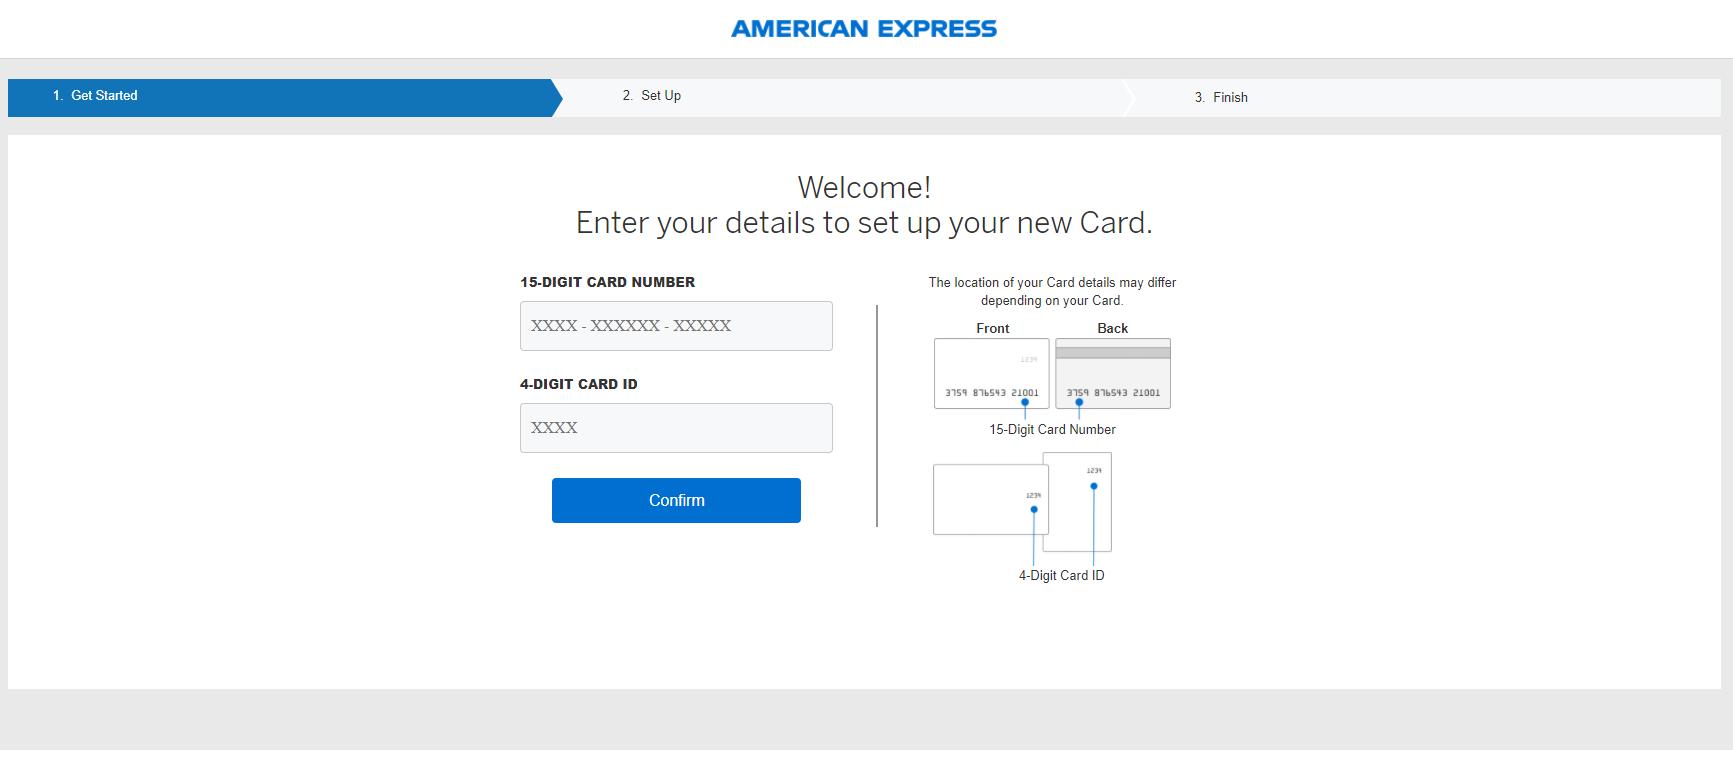 Americanexpress.com/confirmcard - Activate Confirm AMEX Card Now!